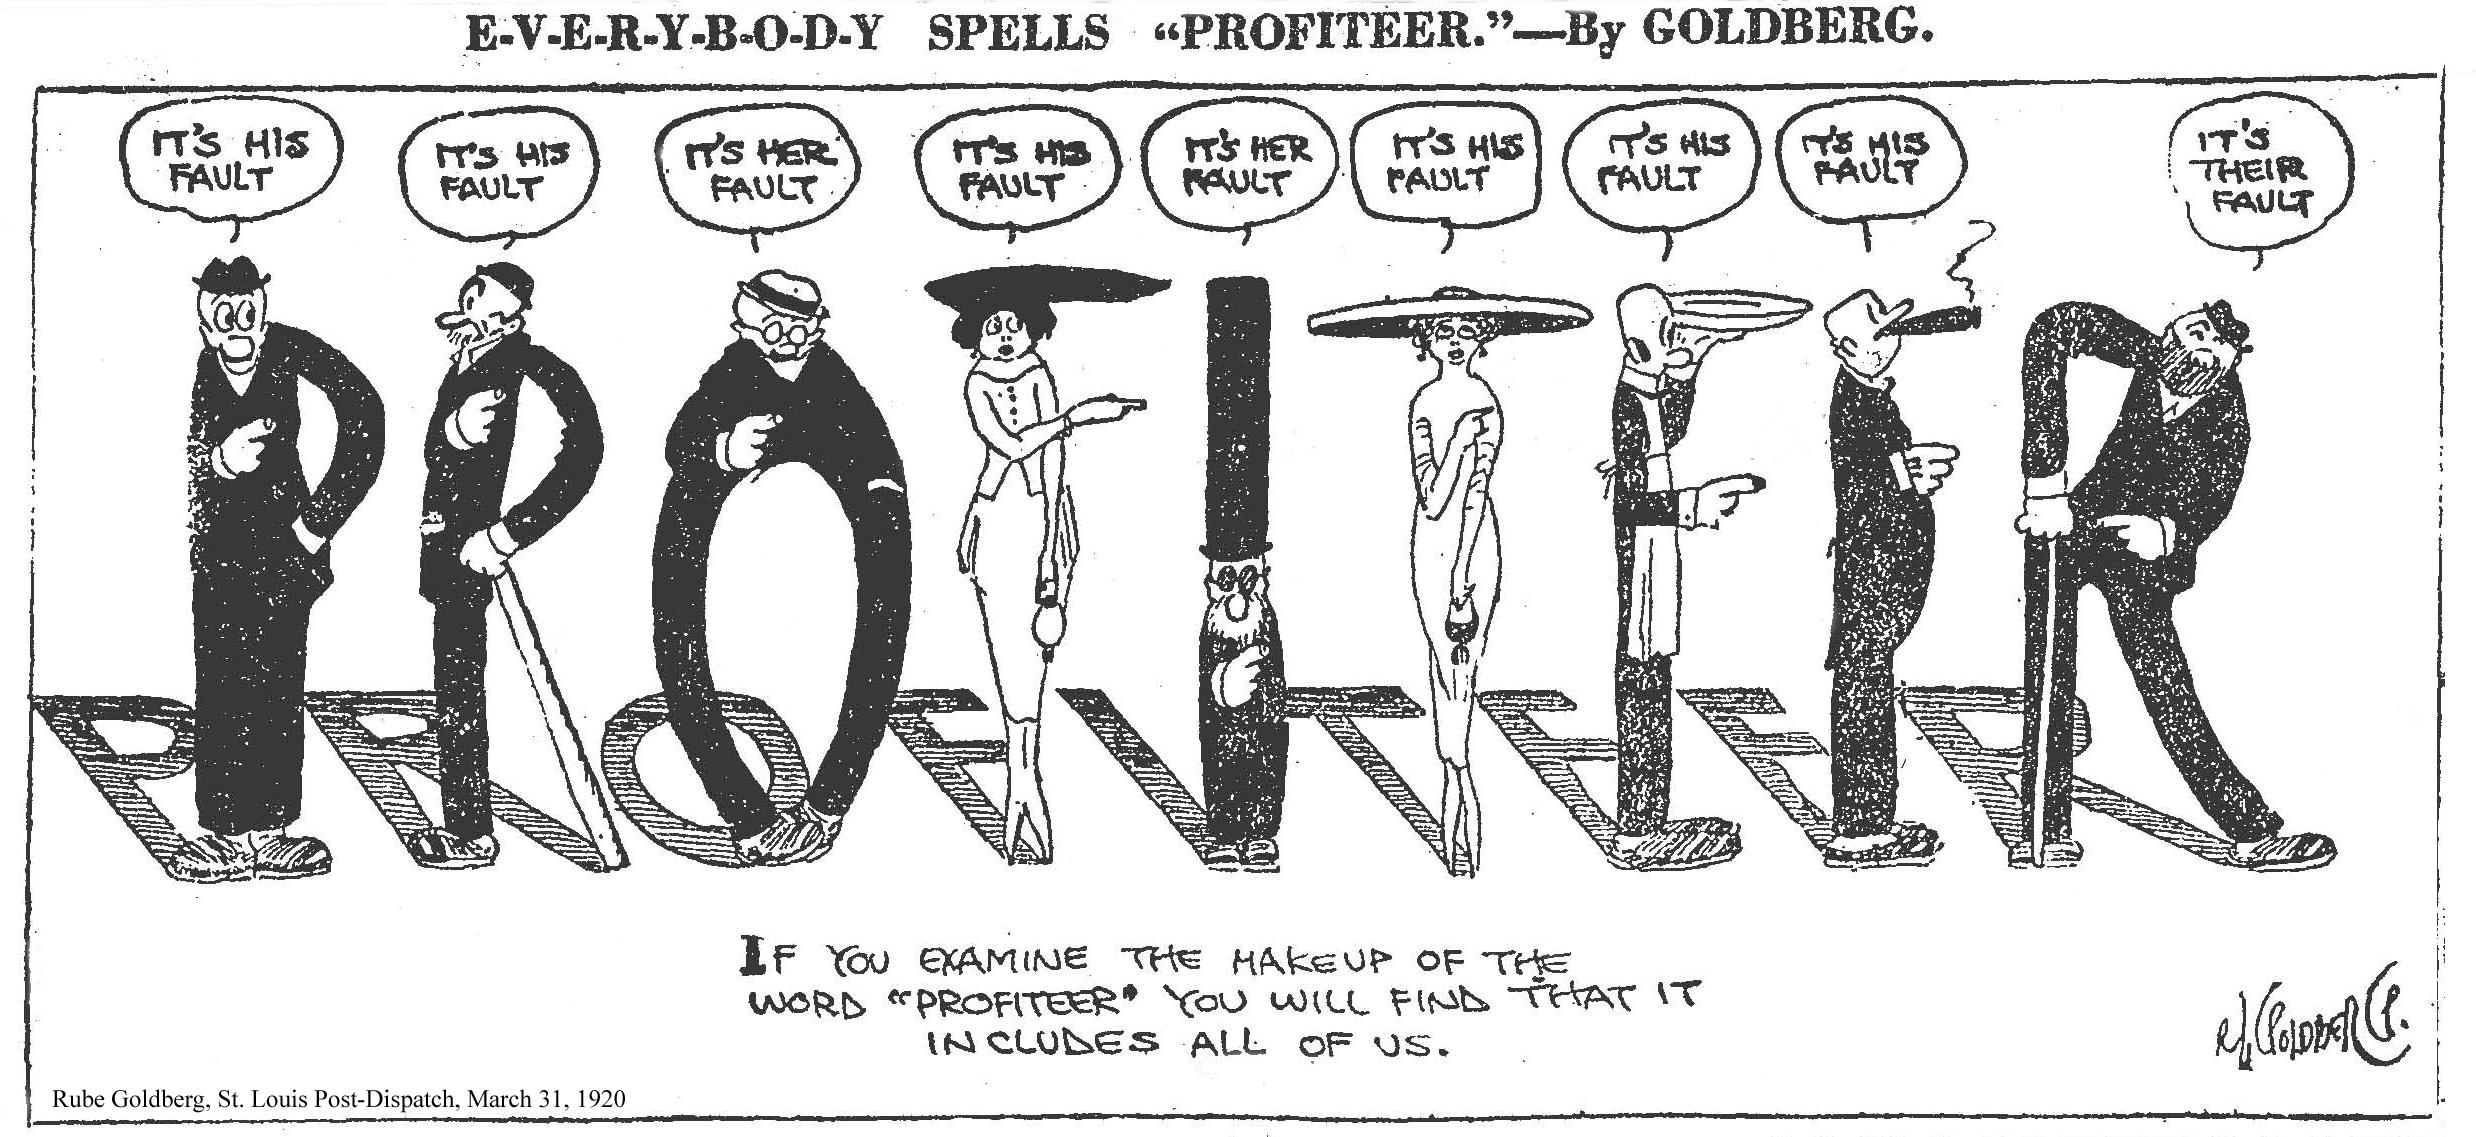 03-31-1920 goldberg profiteer